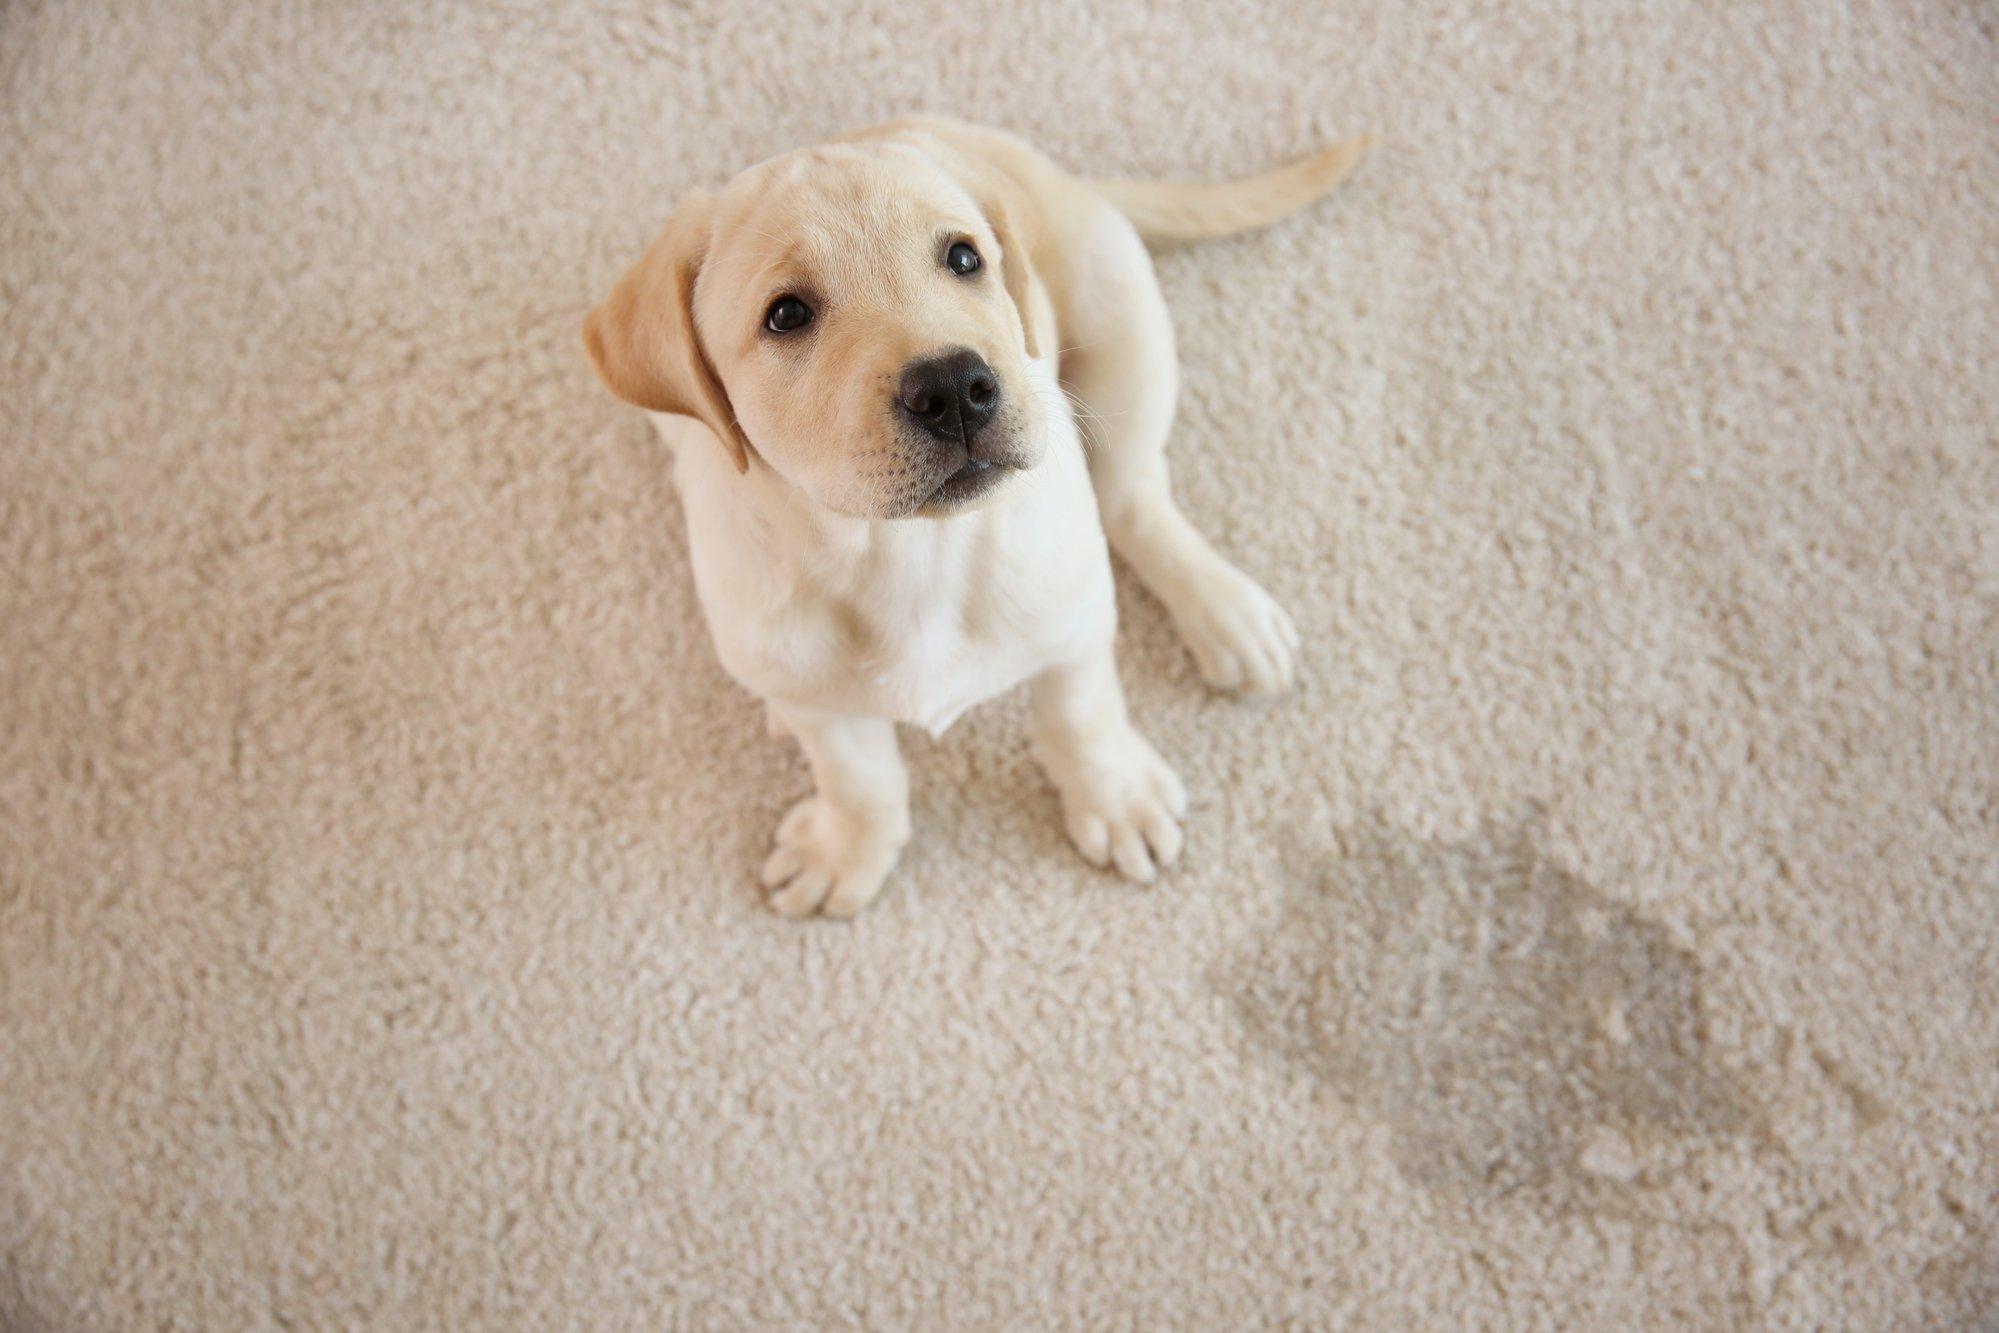 Cute puppy sitting on carpet